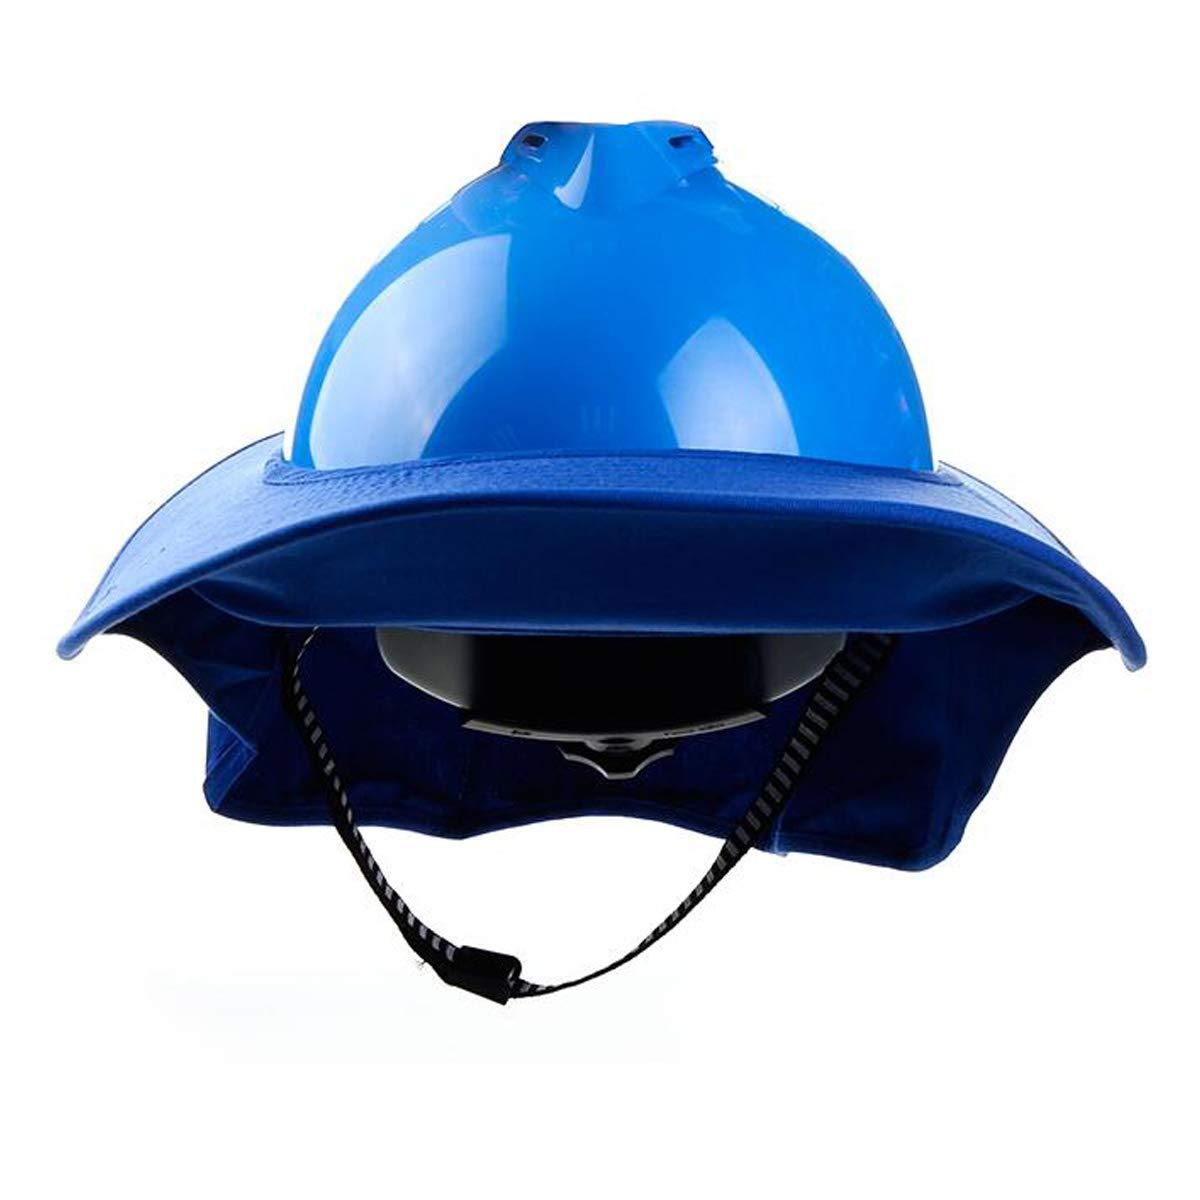 MYAMIA Neck Shield Sun Shade Eye Mask Visor Mask For Brim Safety Hard Hat Protection-Blue